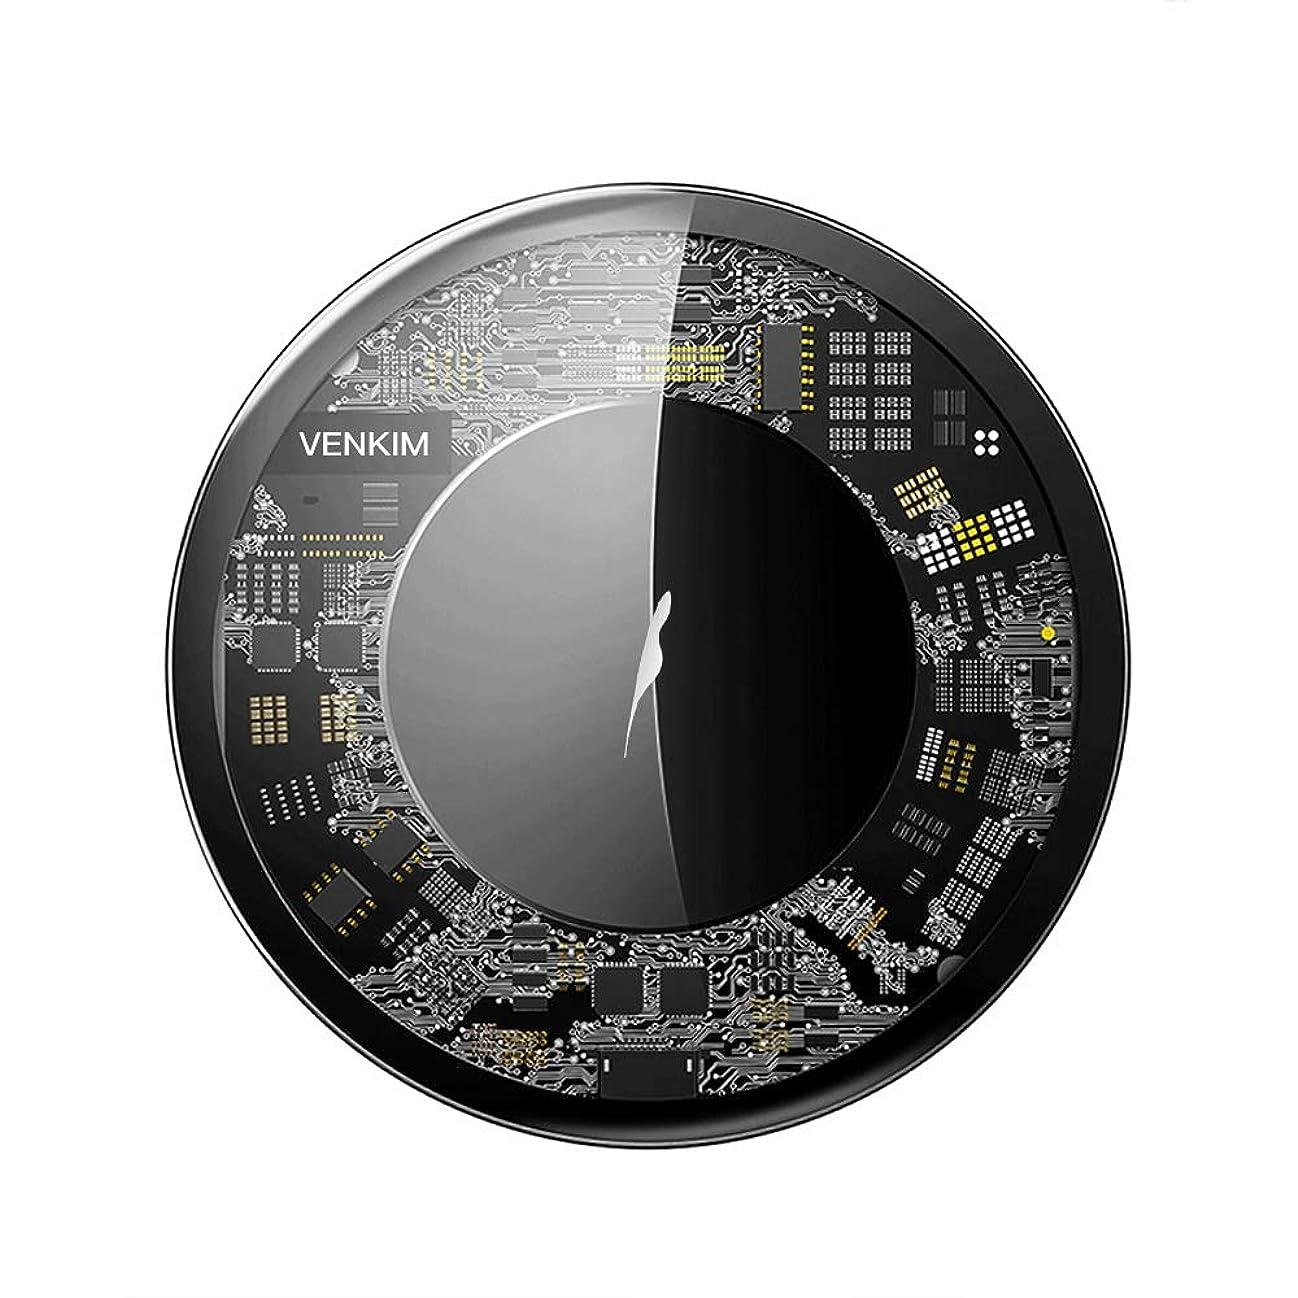 VENKIM qi ワイヤレス充電器 スマホ 充電器 レシーバー ワイヤレスチャージャー 急速充電器 quick charge 置くだけ充電 10W(ブラック)